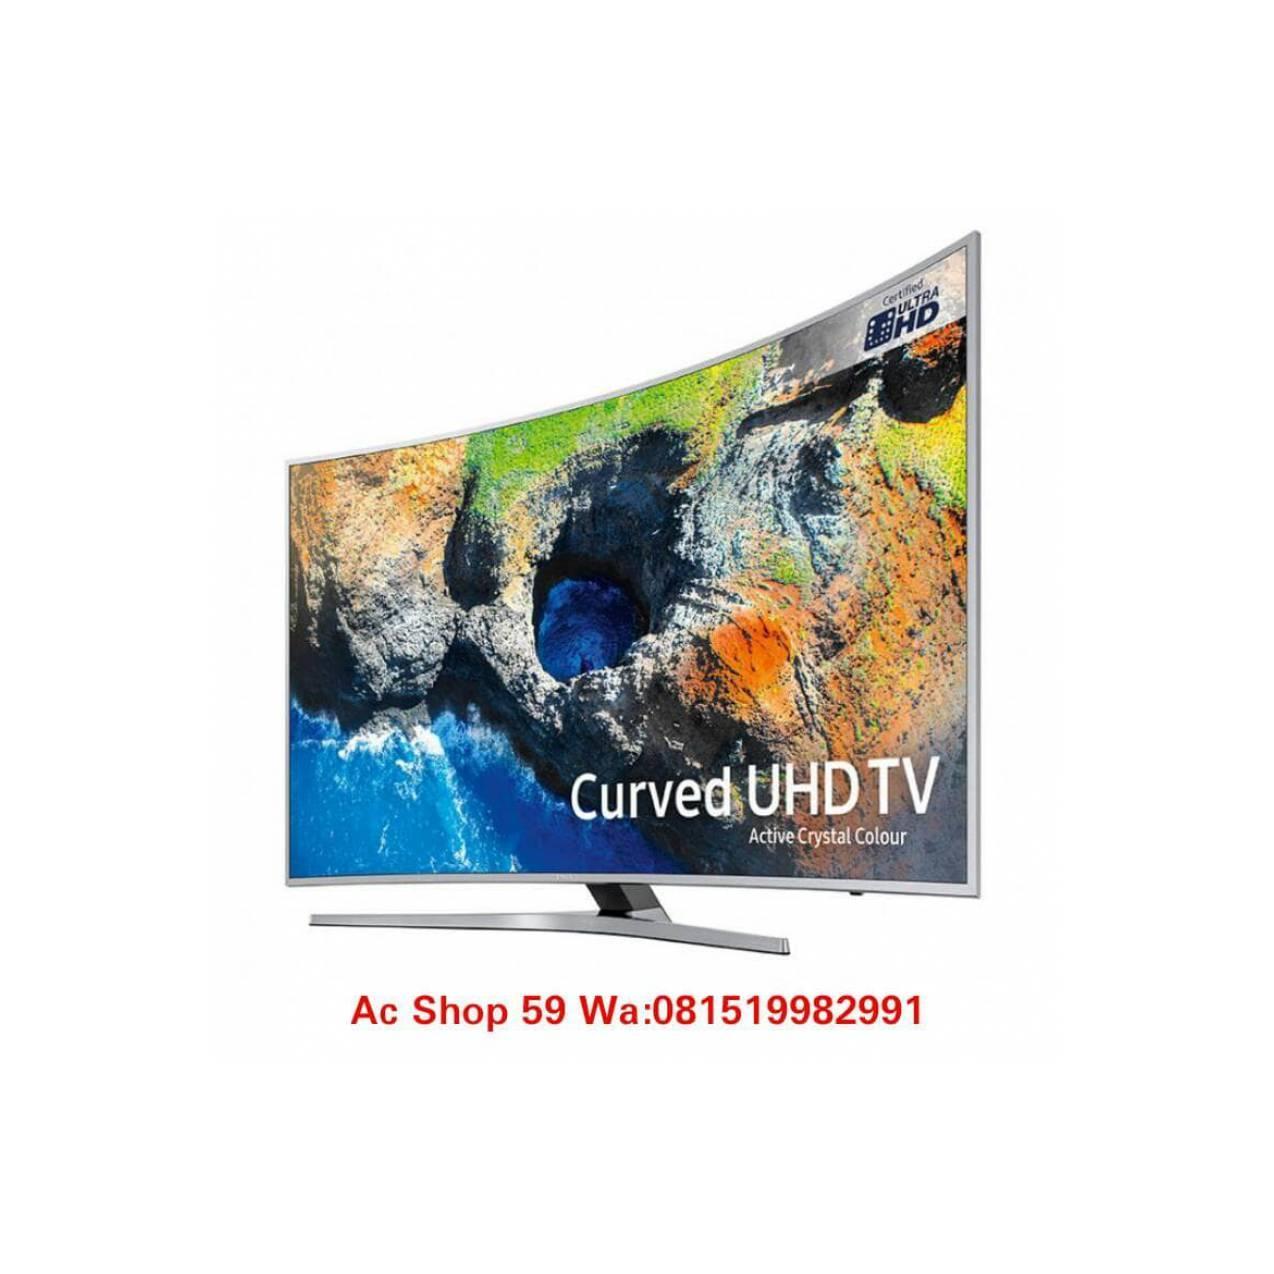 SAMSUNG 55 MU6300 UHD 4K SMART 55 INCH LED TV CURVED 55MU6300 NEW 2017